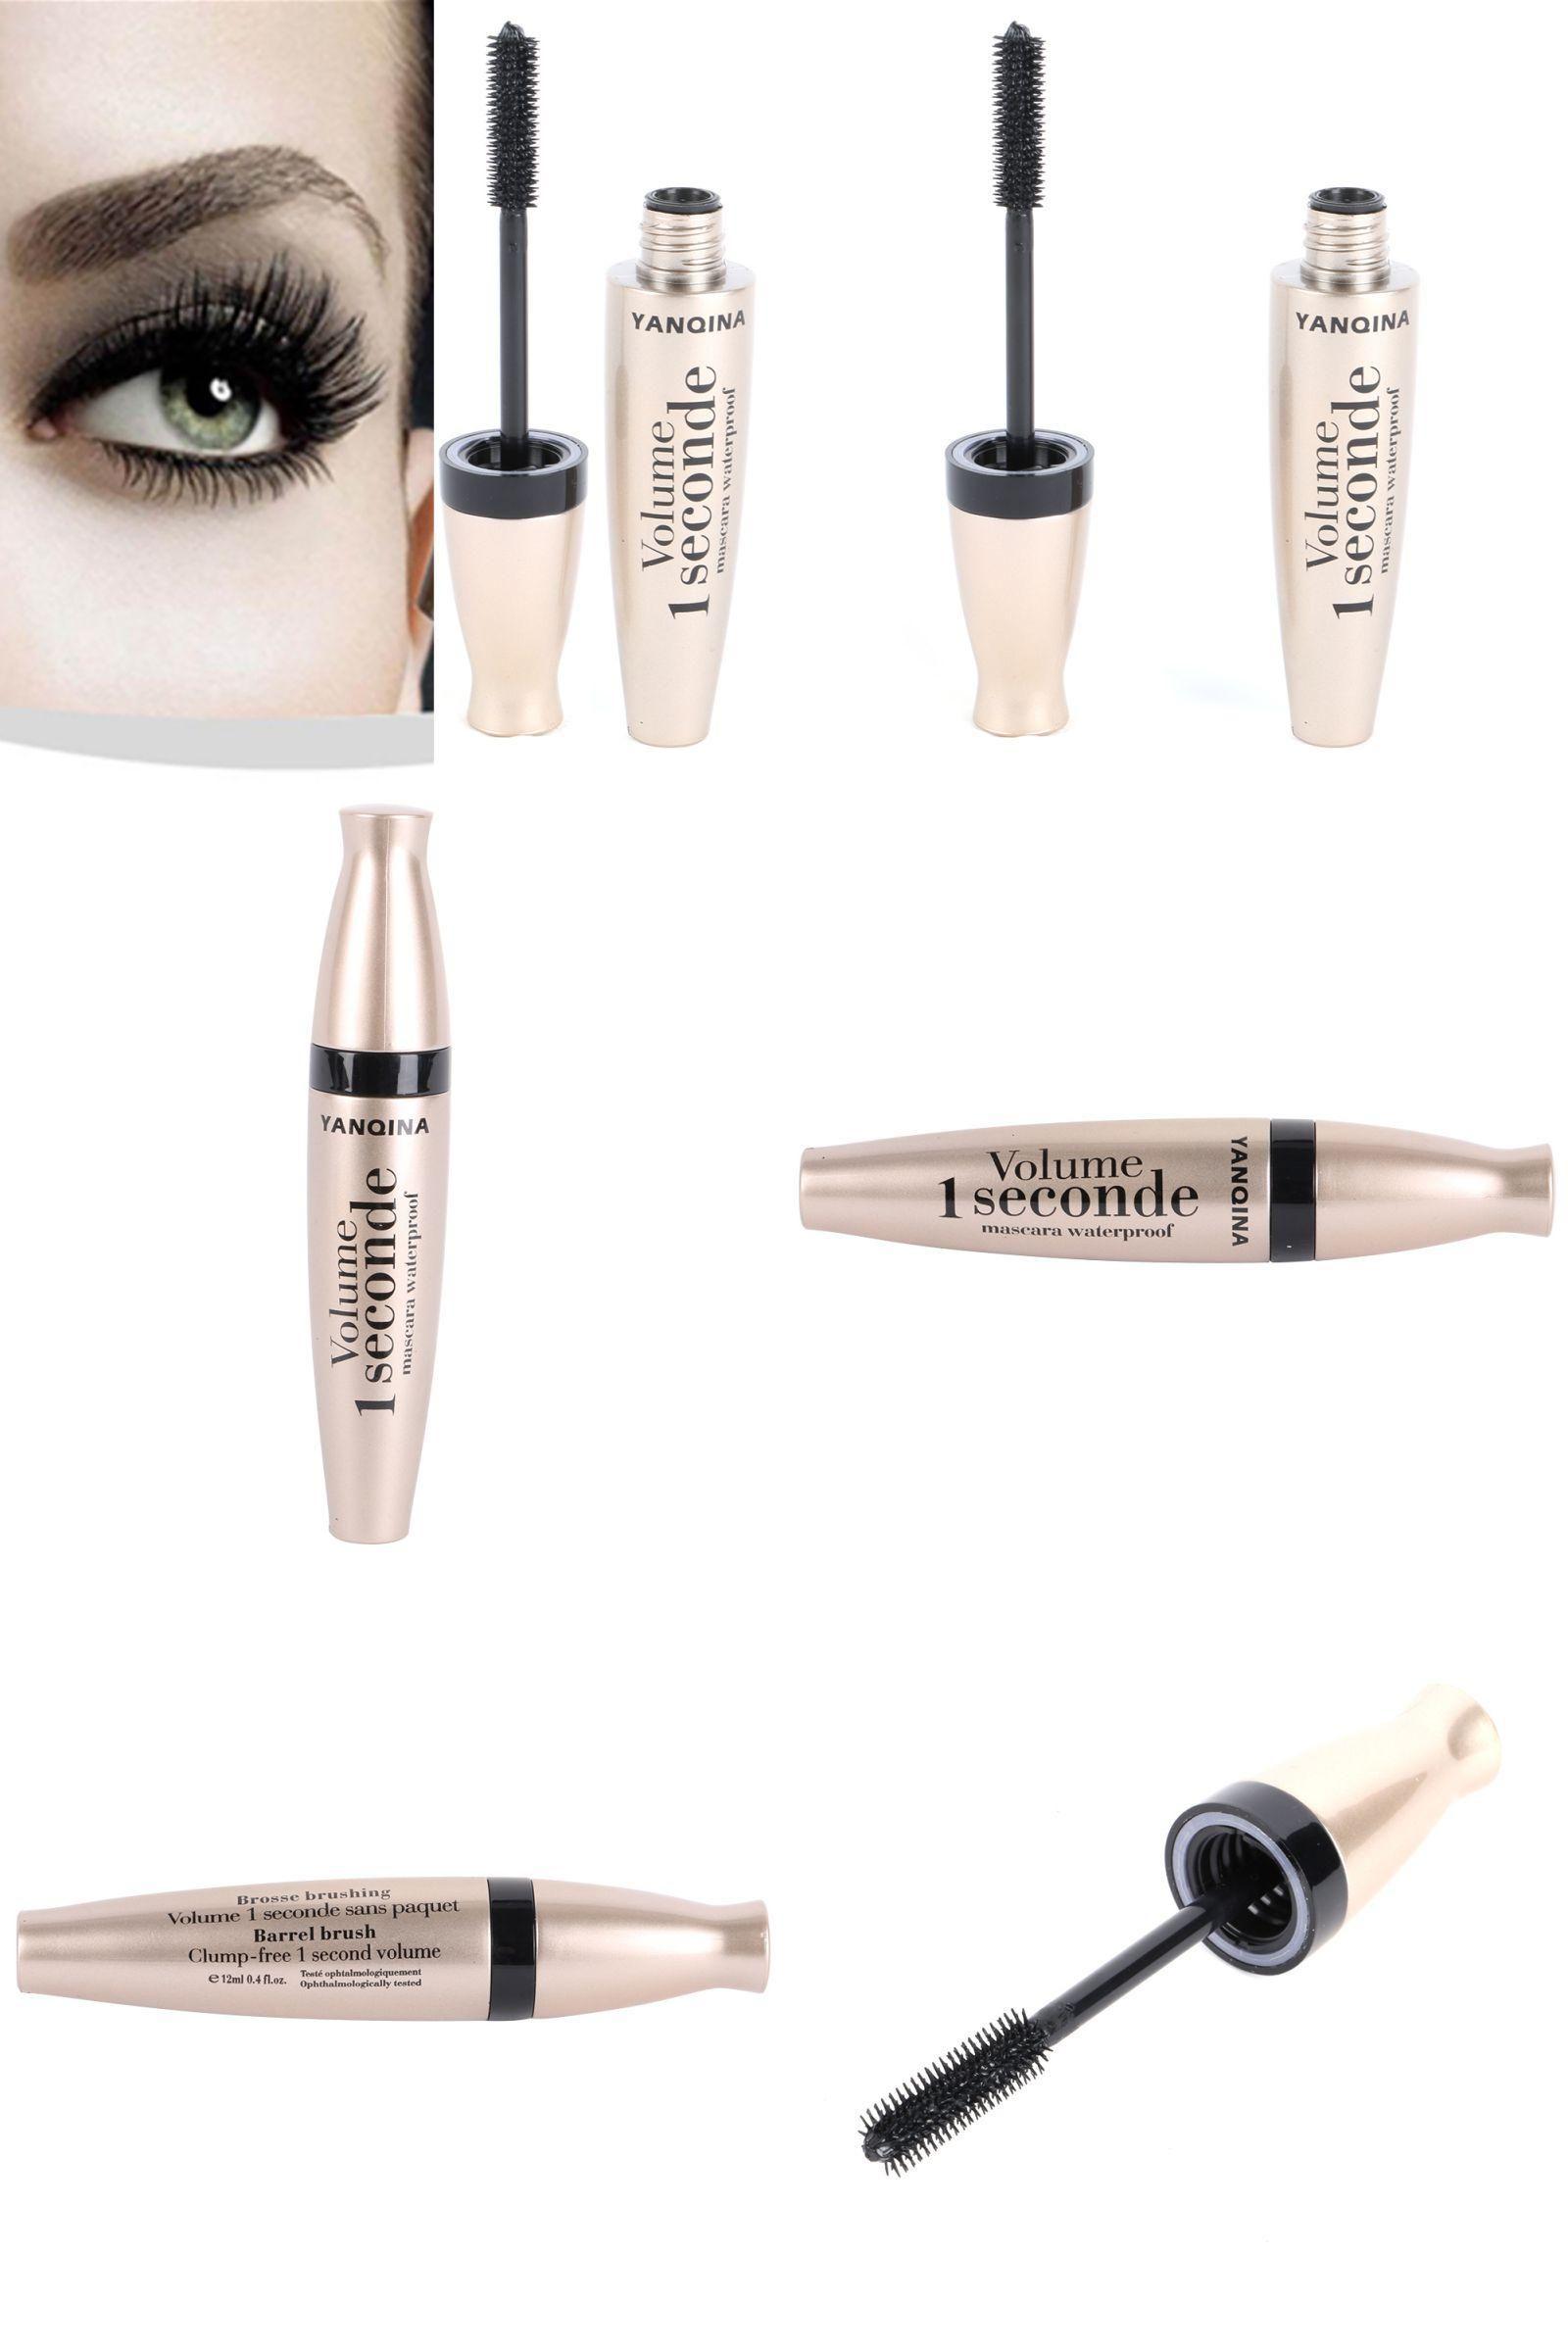 Visit To Buy Makeup Beauty Mascara Thick Waterproof Eyelash